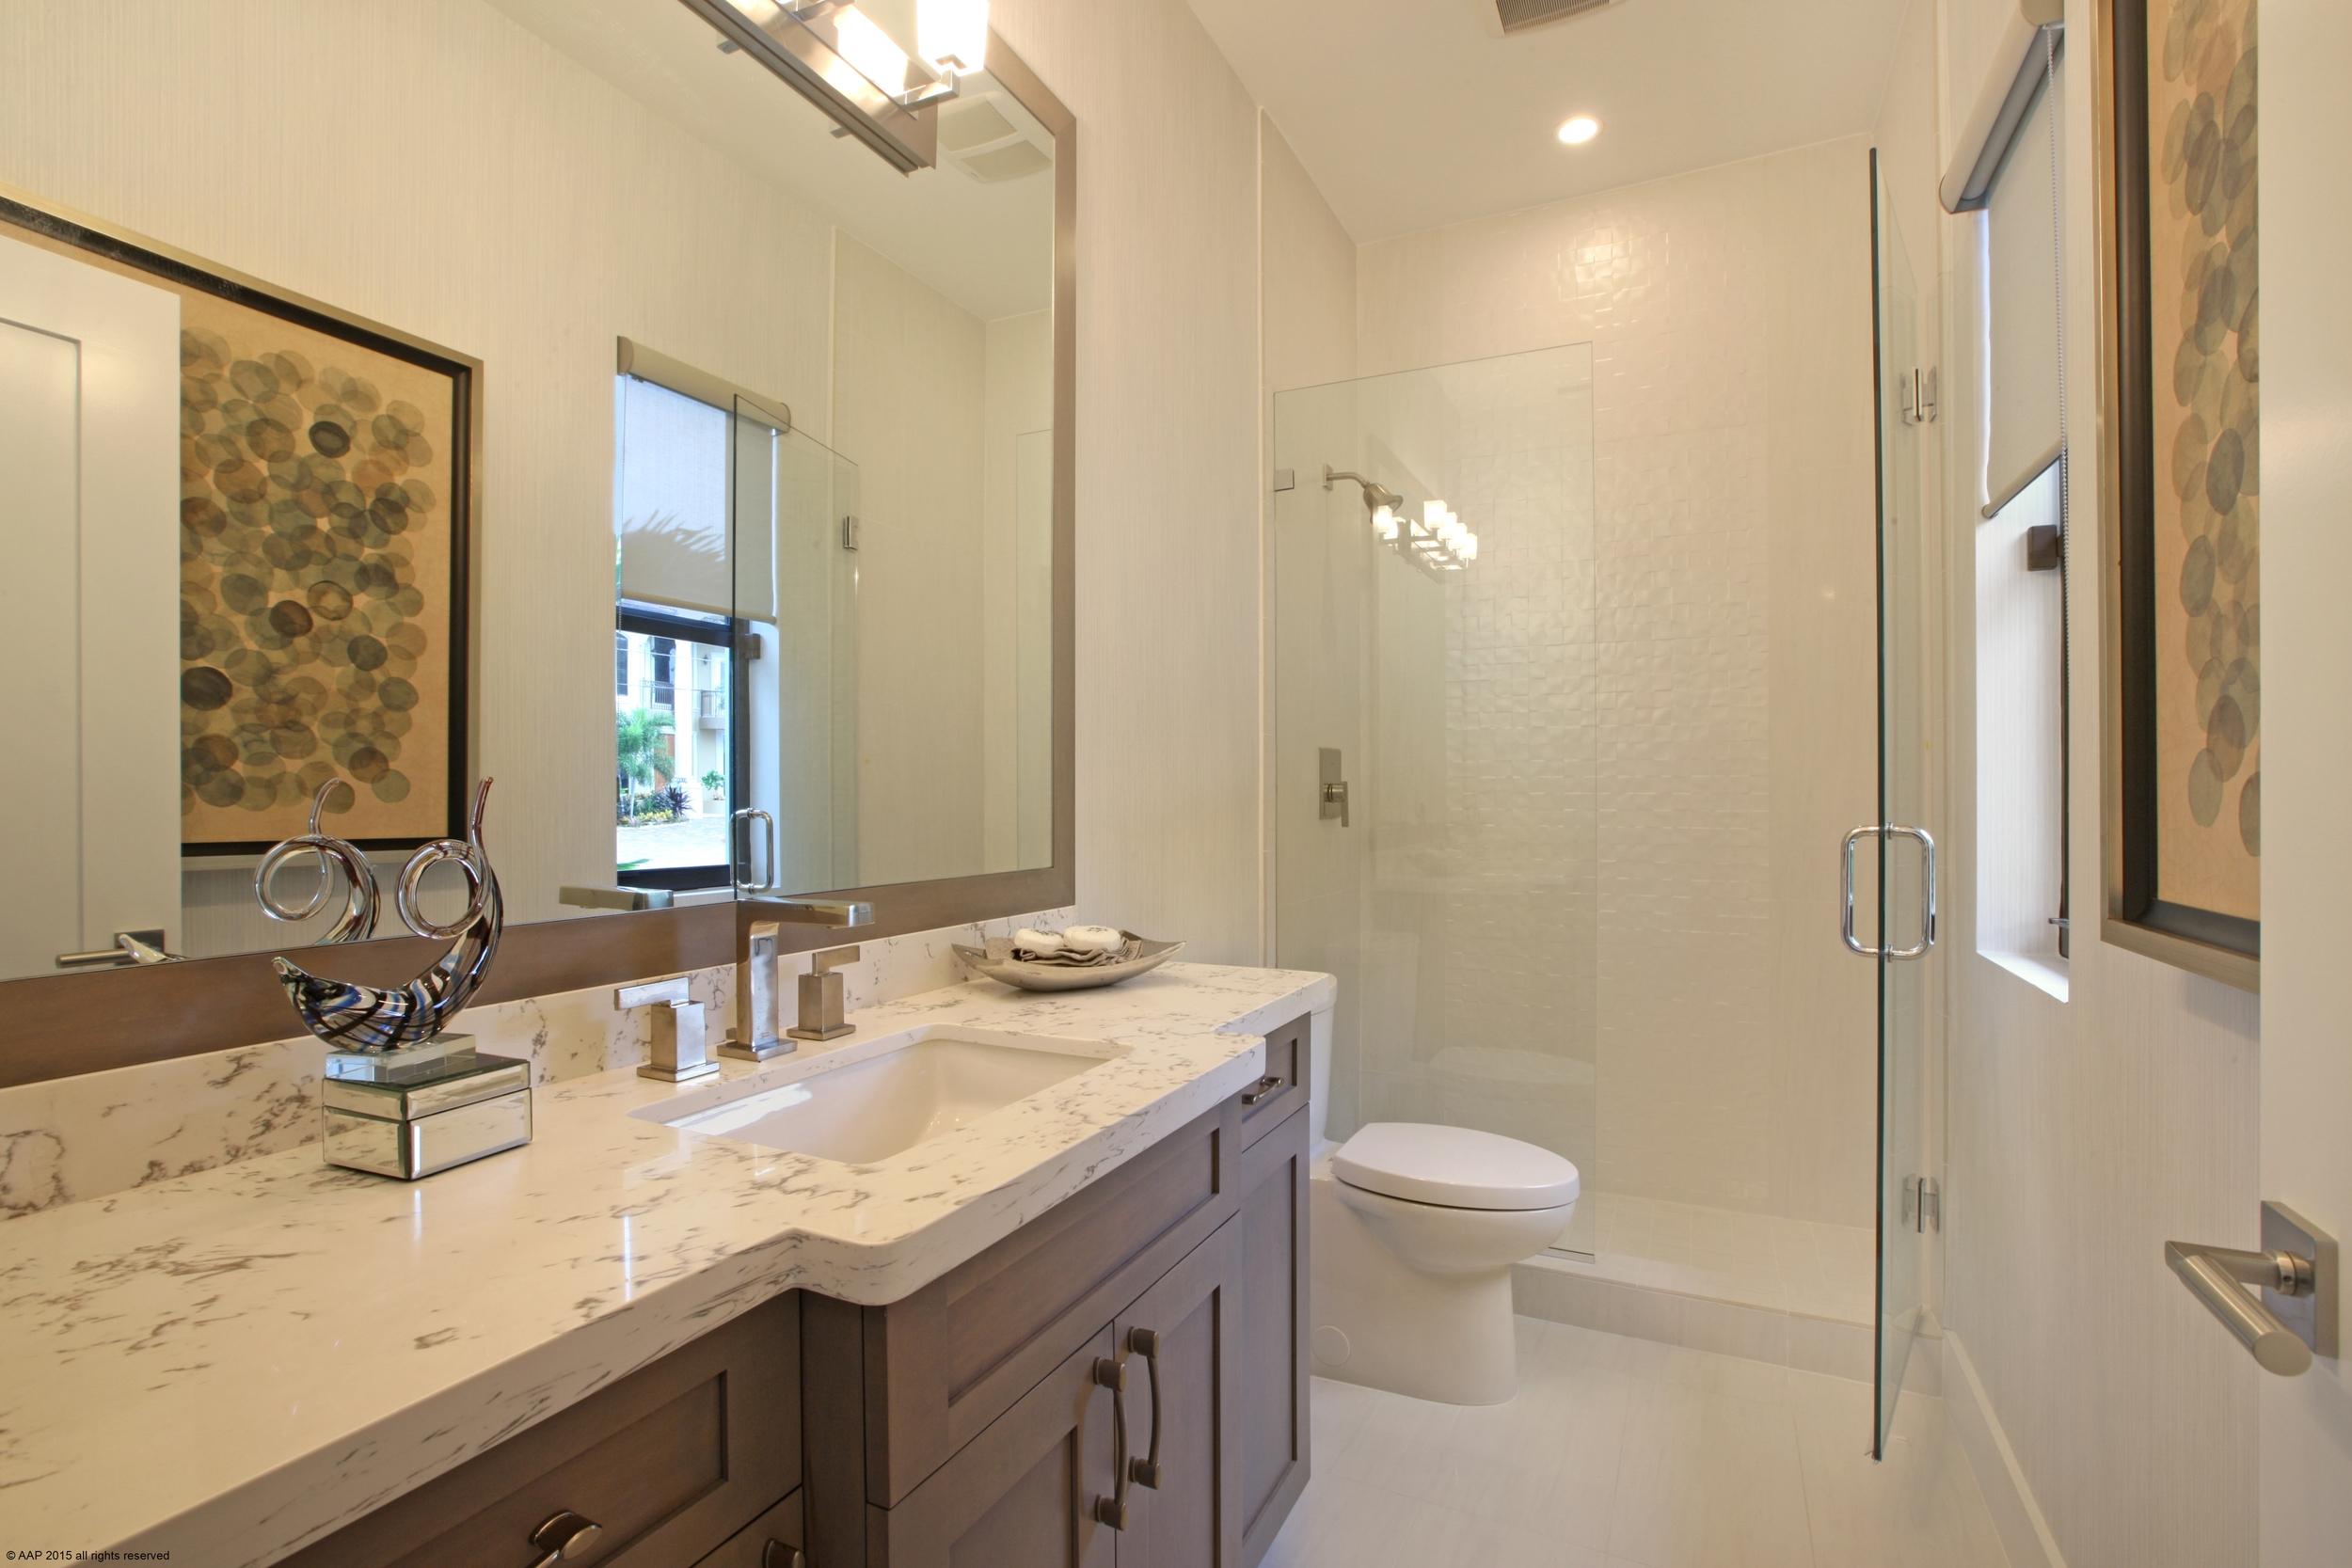 Guest Bathroom Inspiration